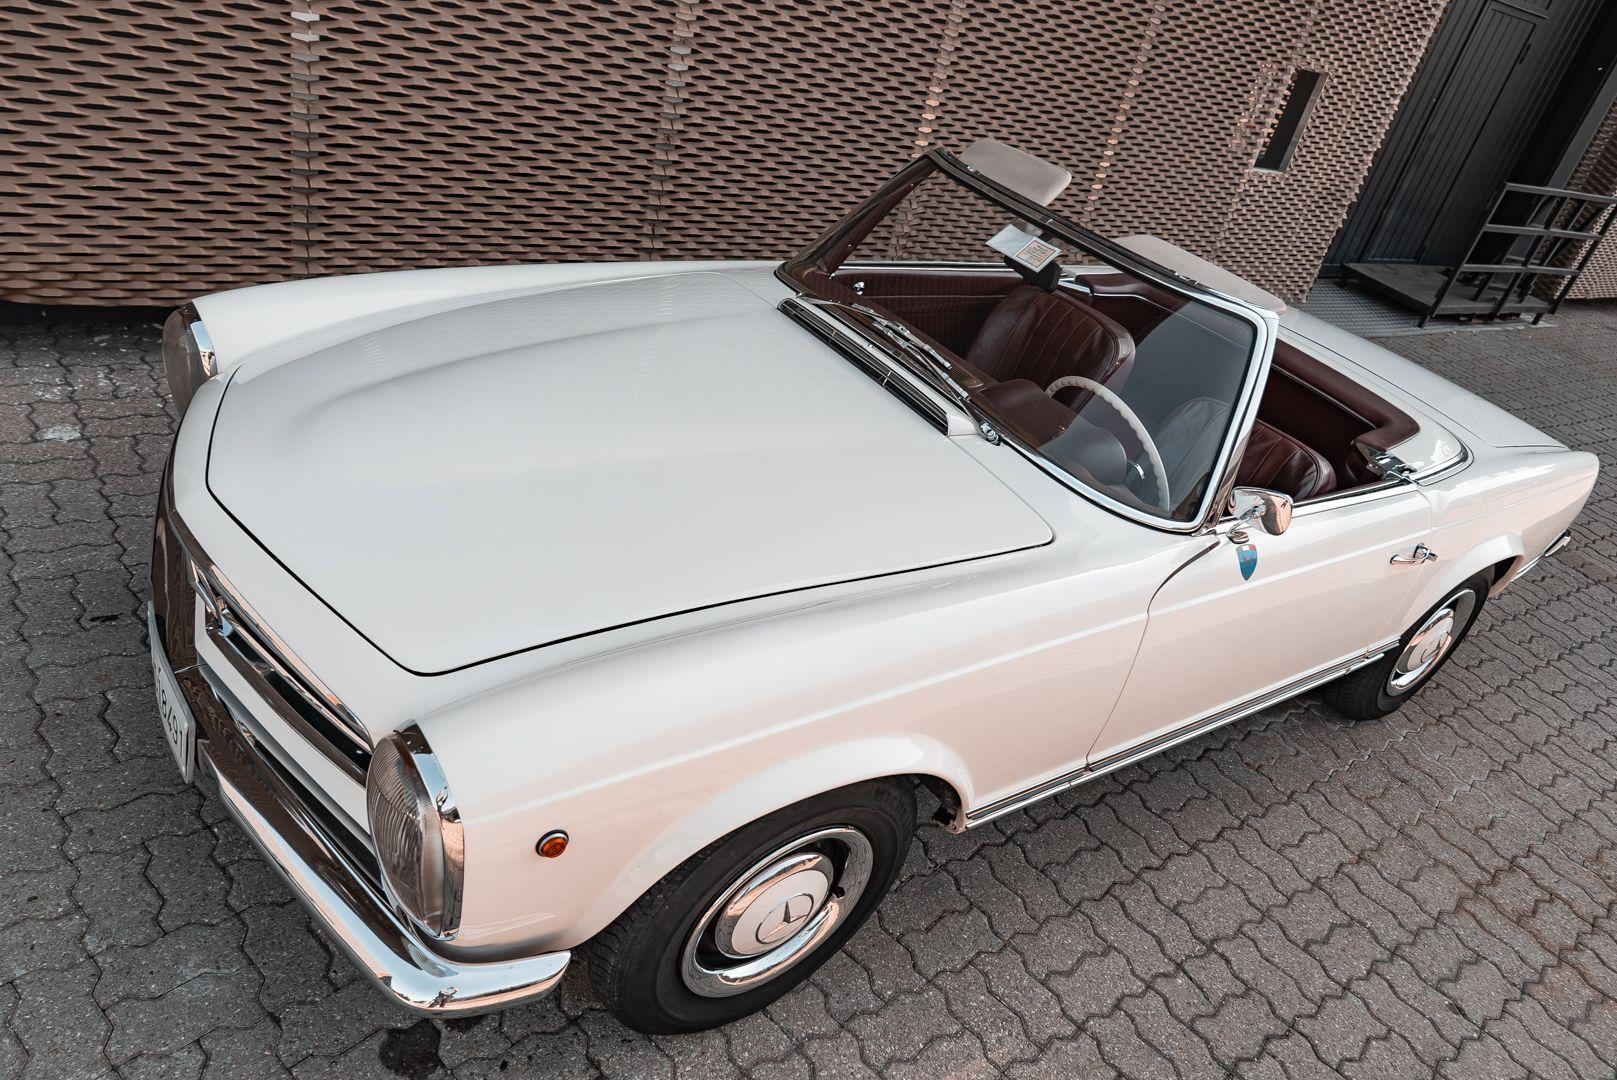 1965 Mercedes-Benz SL230 Pagoda 78521